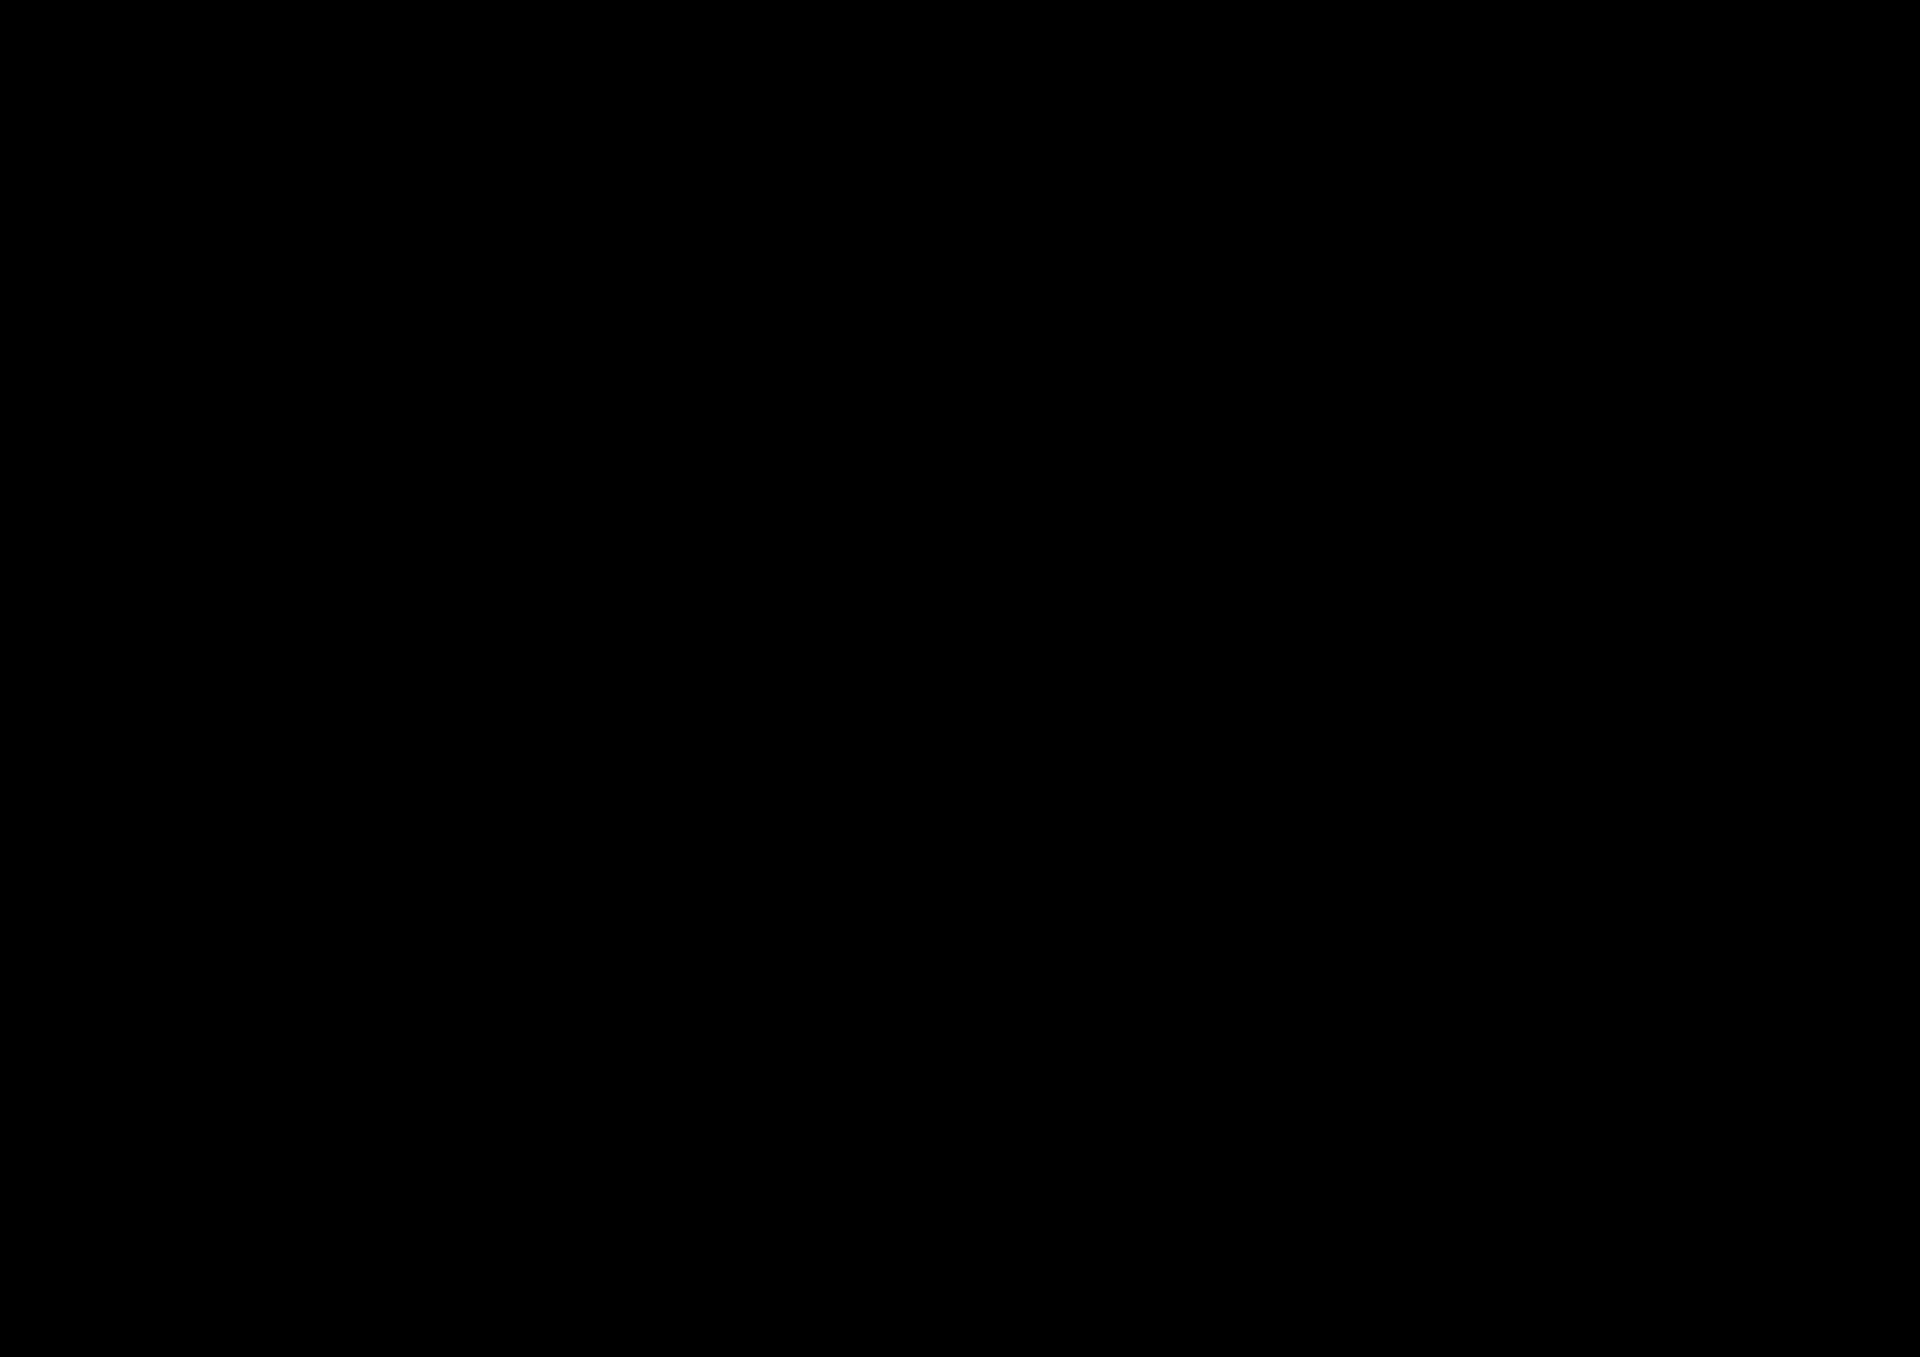 31 symboles graphiques